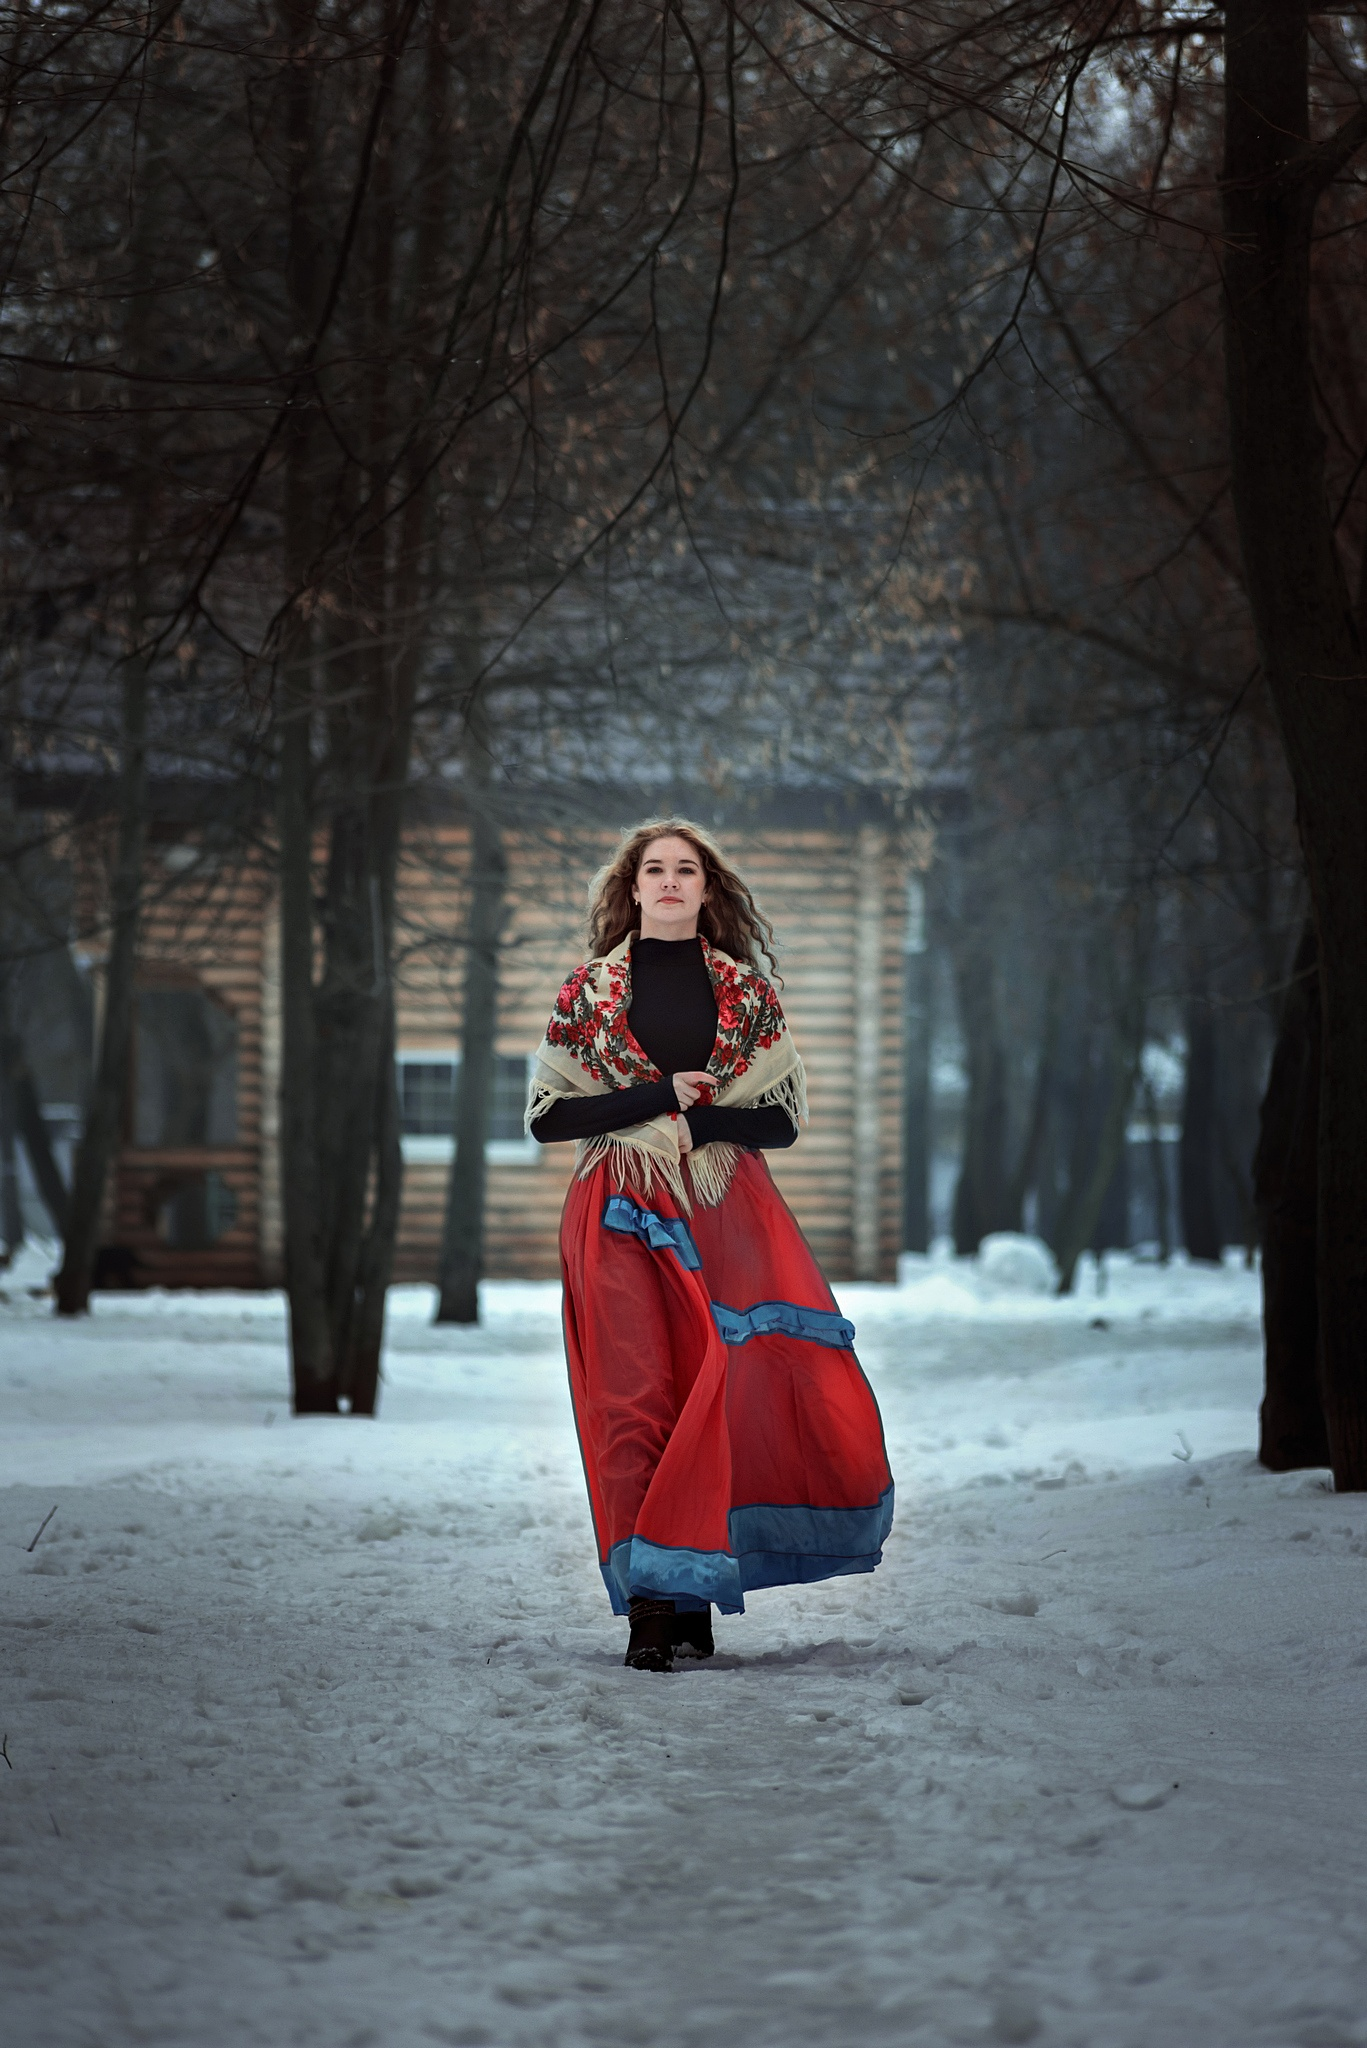 Kristina by Pavel Cherepko